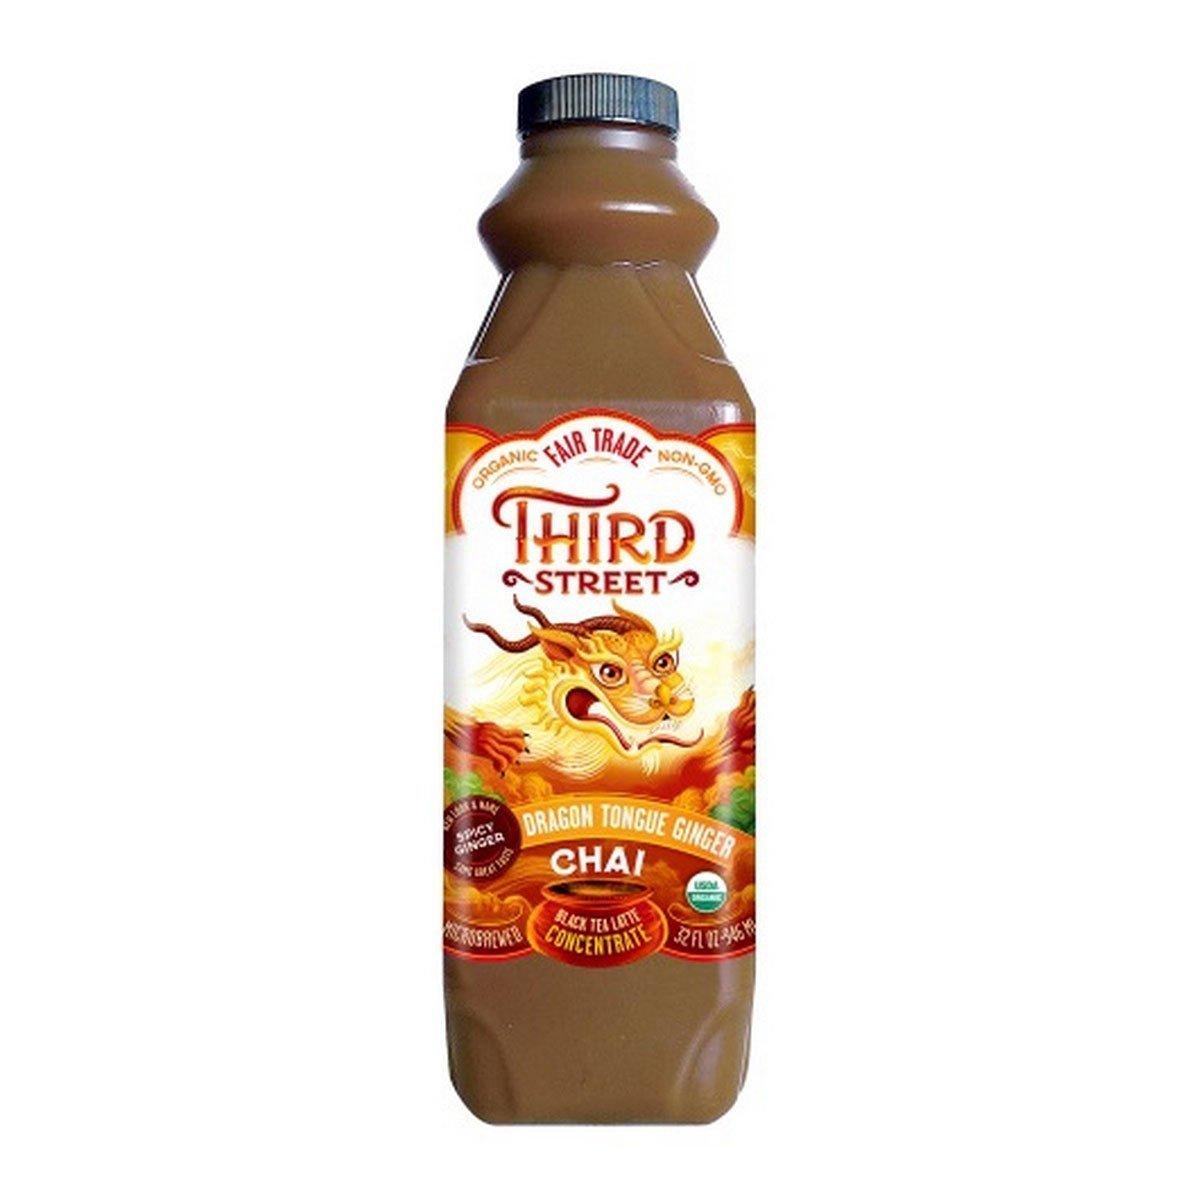 Third Street Chai, organic, Conc ,Dragon Tongue Ginger, Pack of 6, Size - 32 FZ, Quantity - 1 Case by Third Street Chai